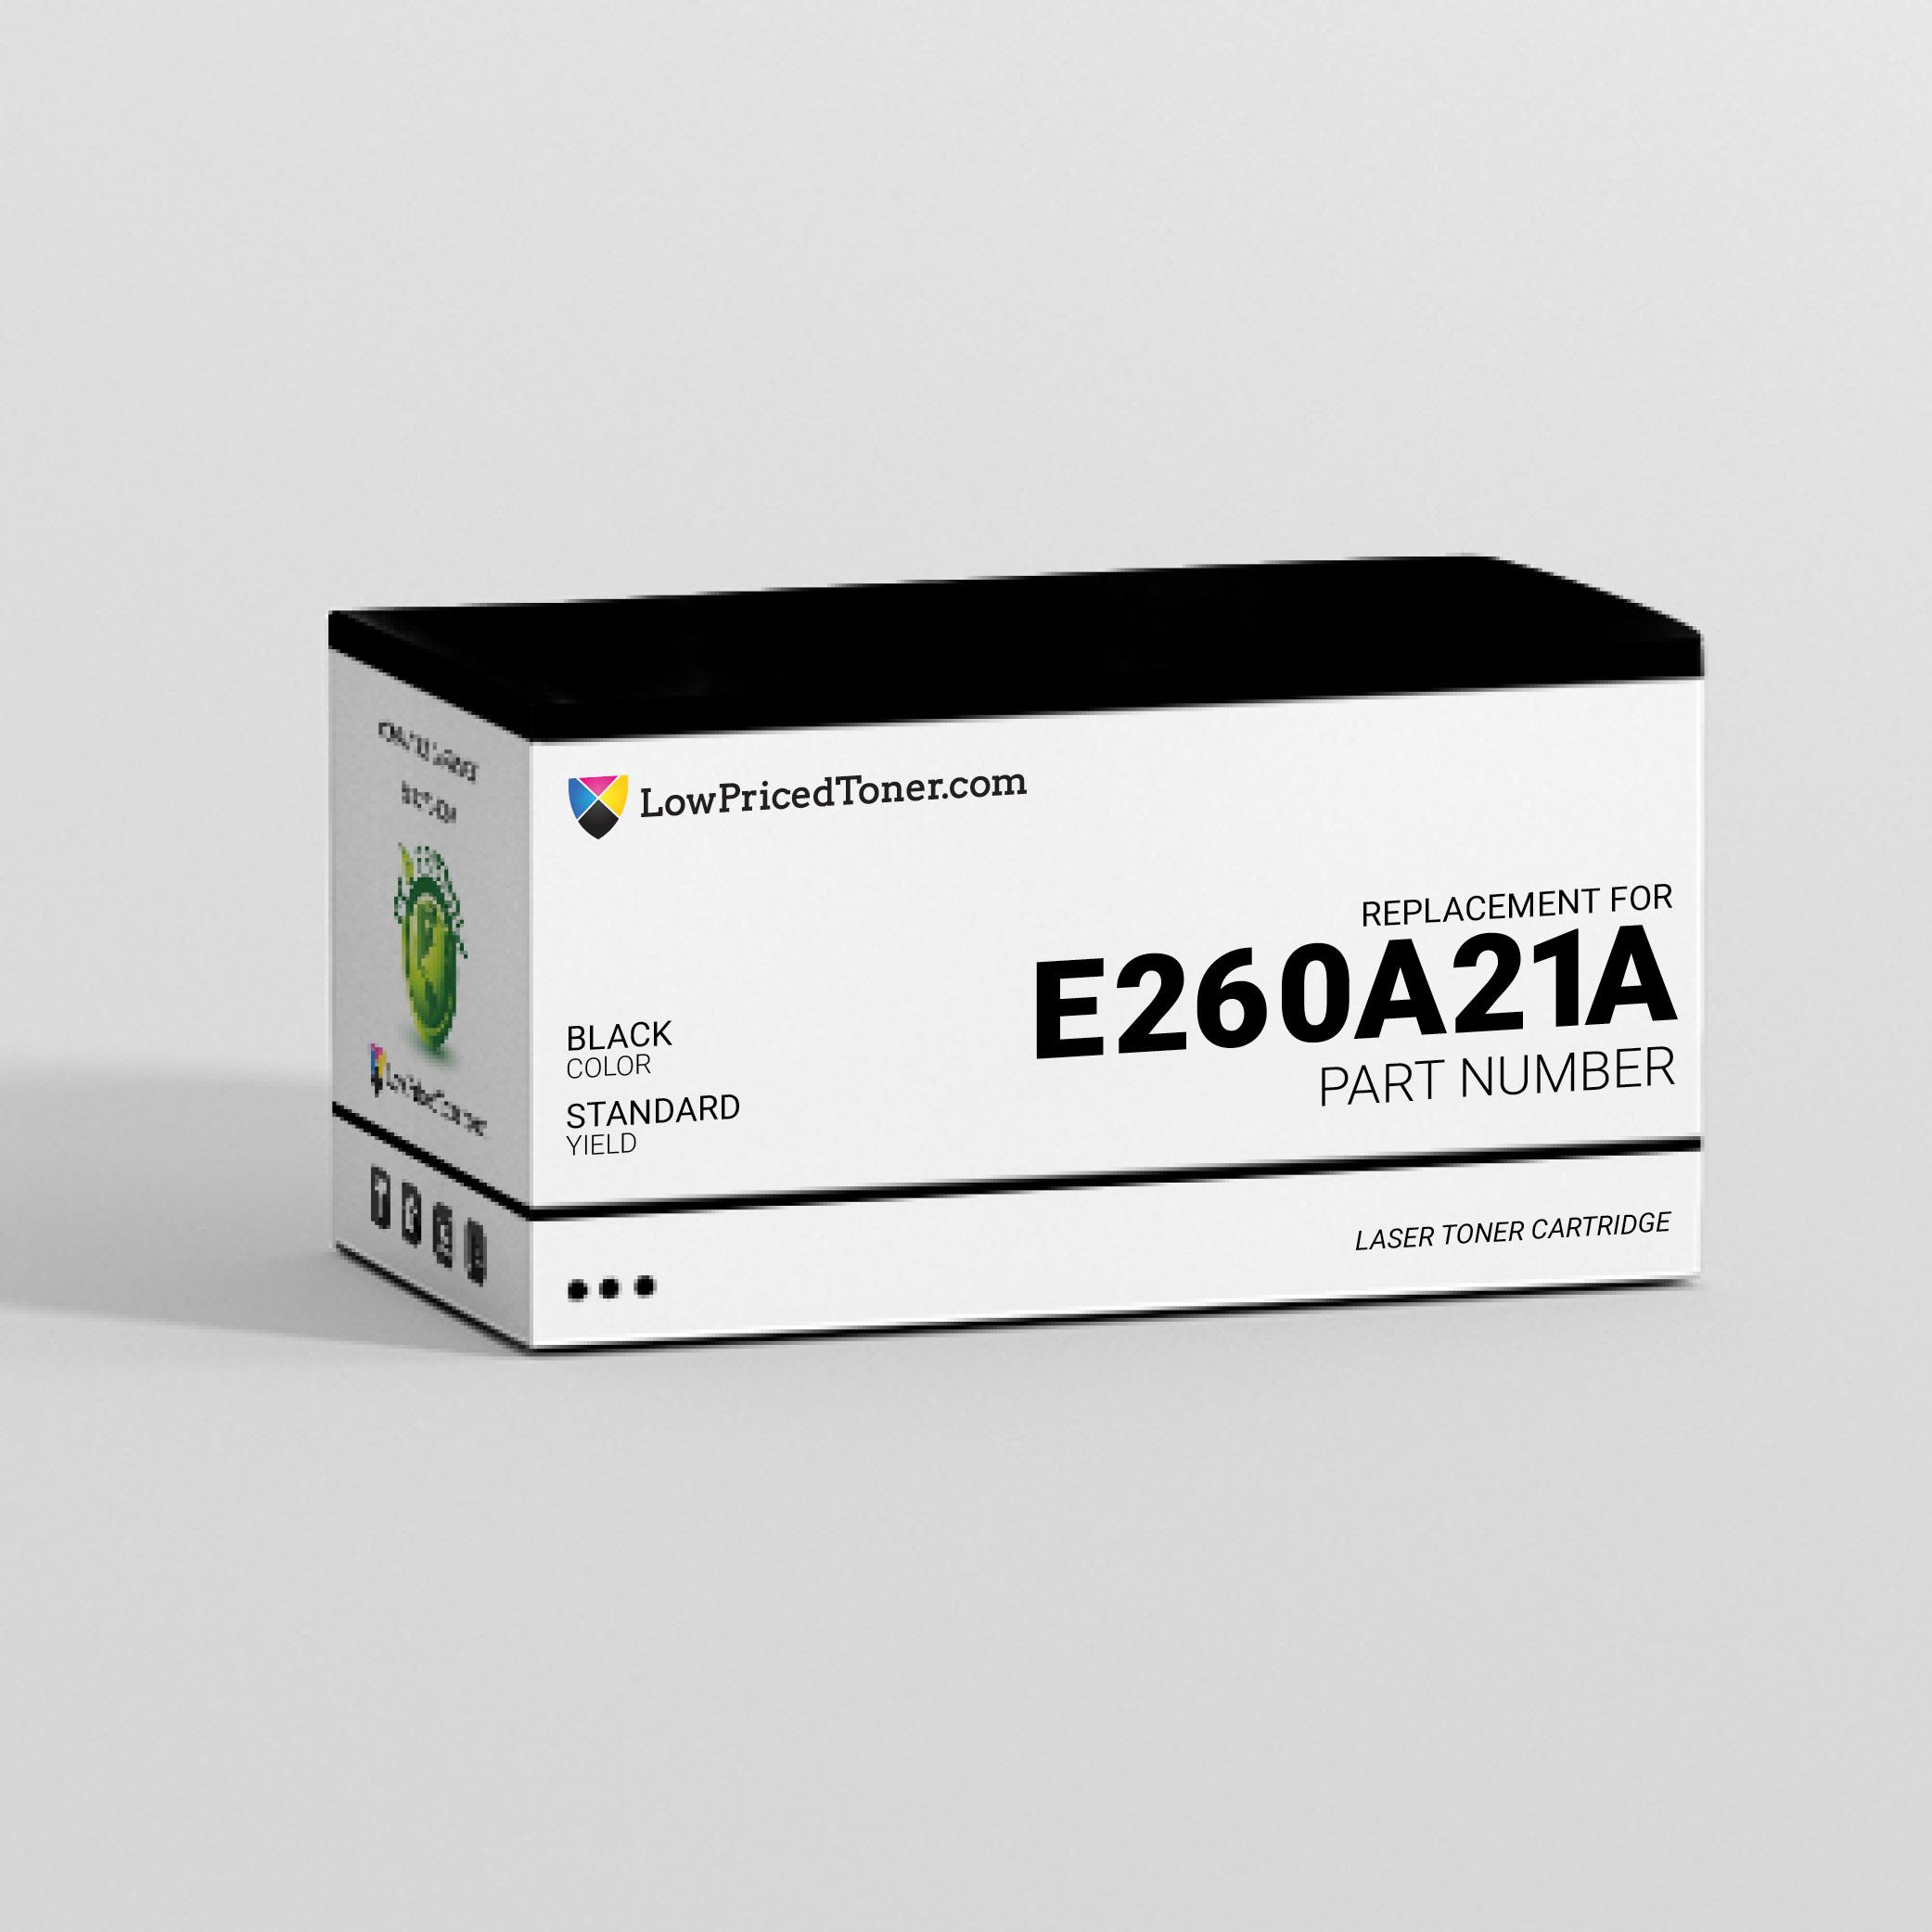 Lexmark E260A21A Remanufactured Black Laser Toner Cartridge